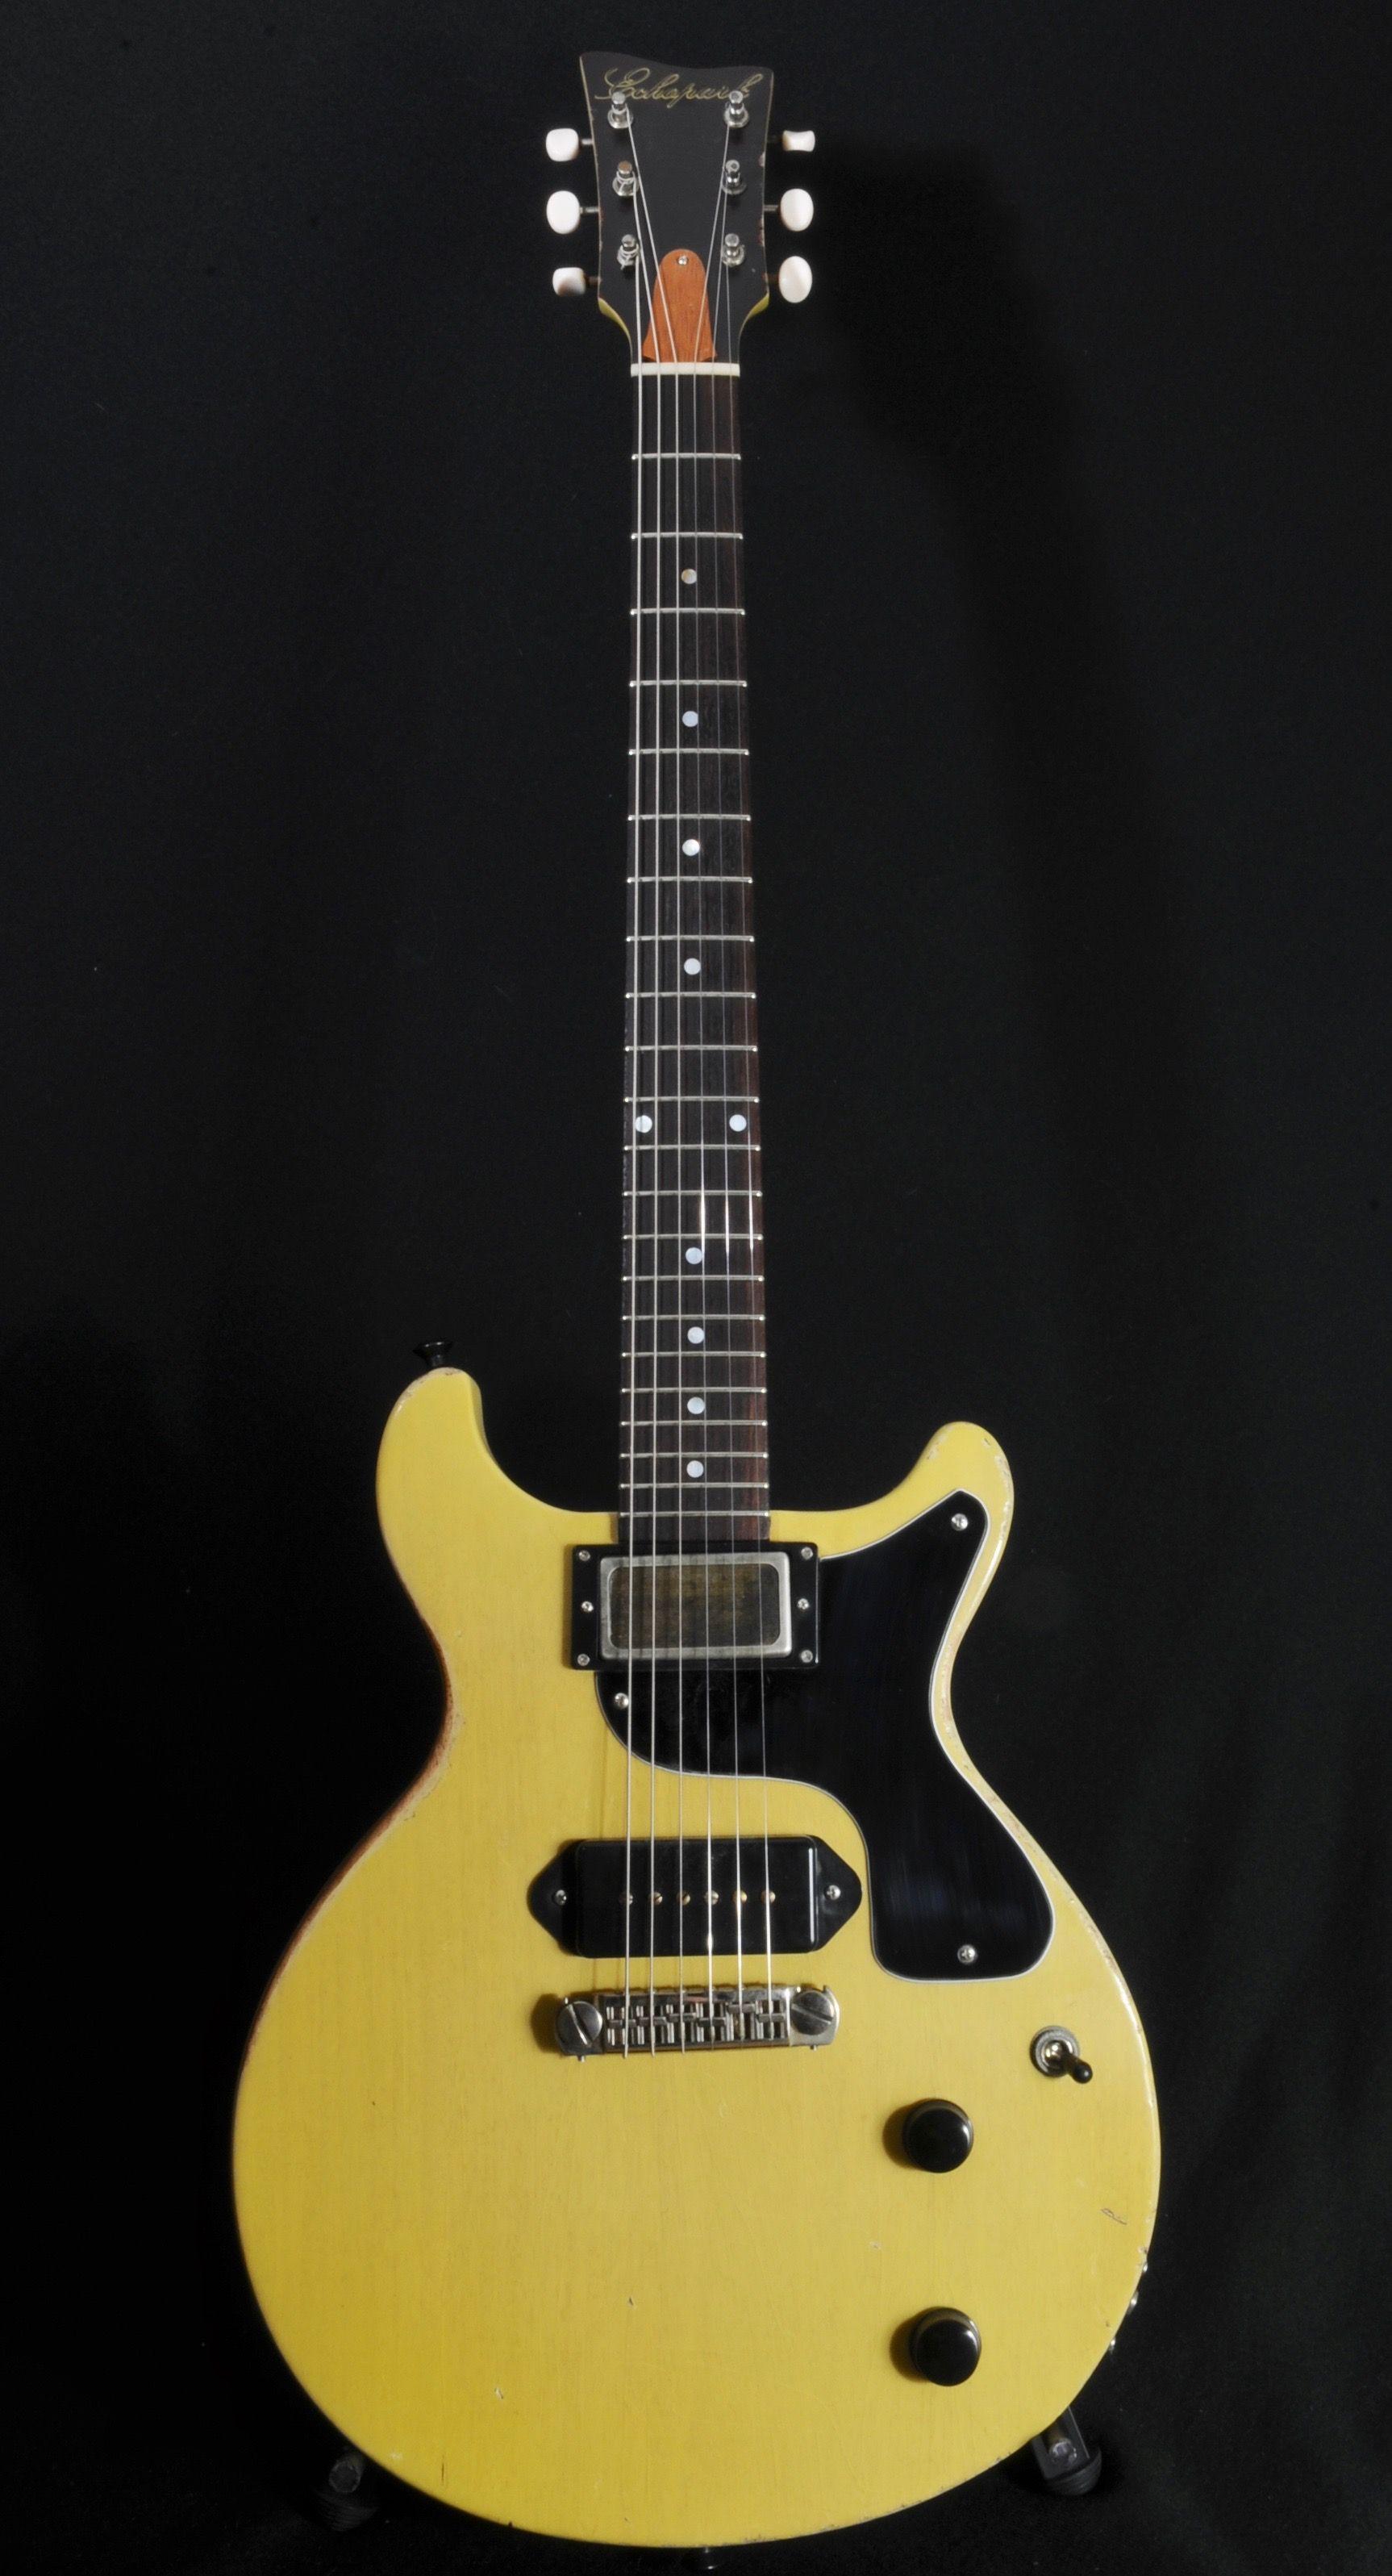 Echopark 59 Standard 2014 Tv Yellow Guitars In 2018 Pinterest